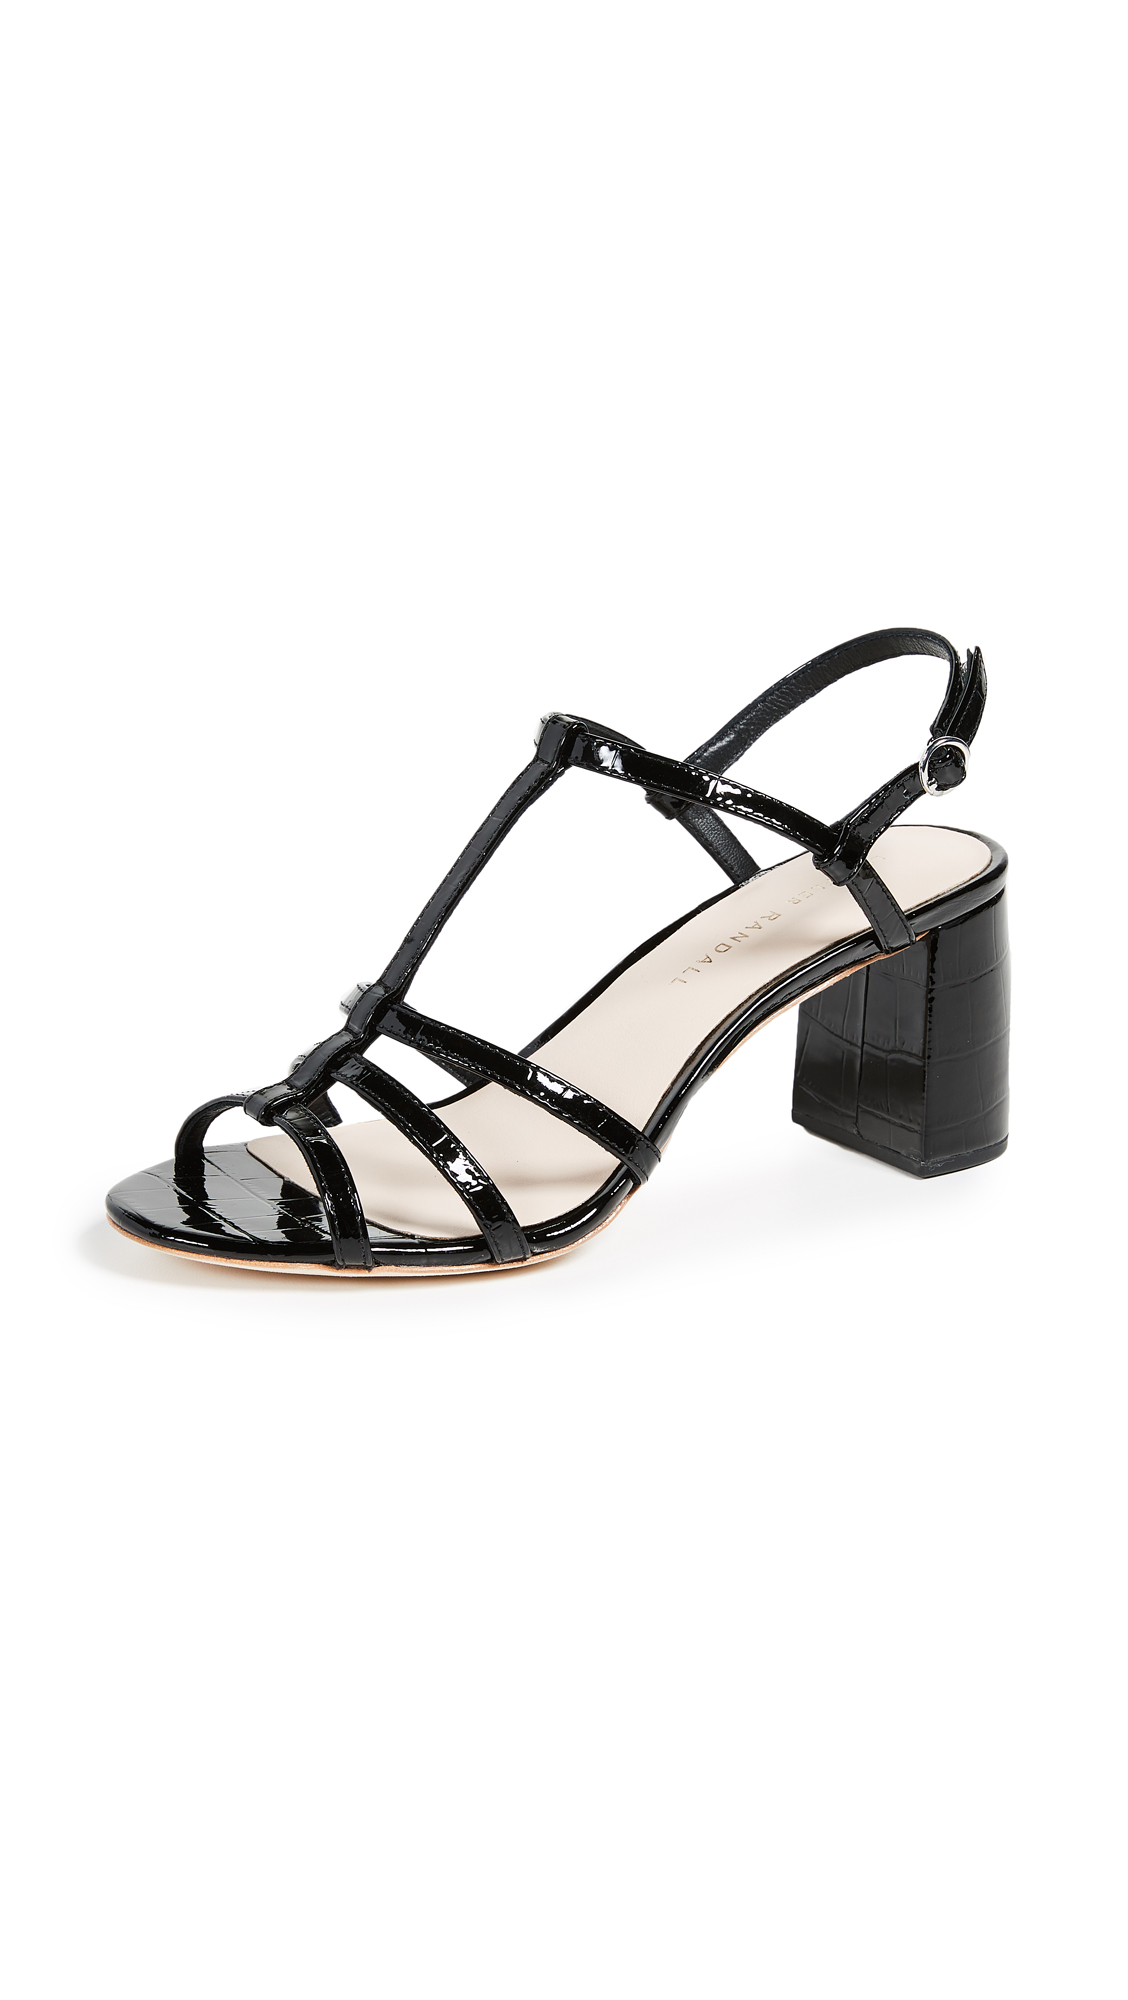 Loeffler Randall Elena Strappy Sandals - Black